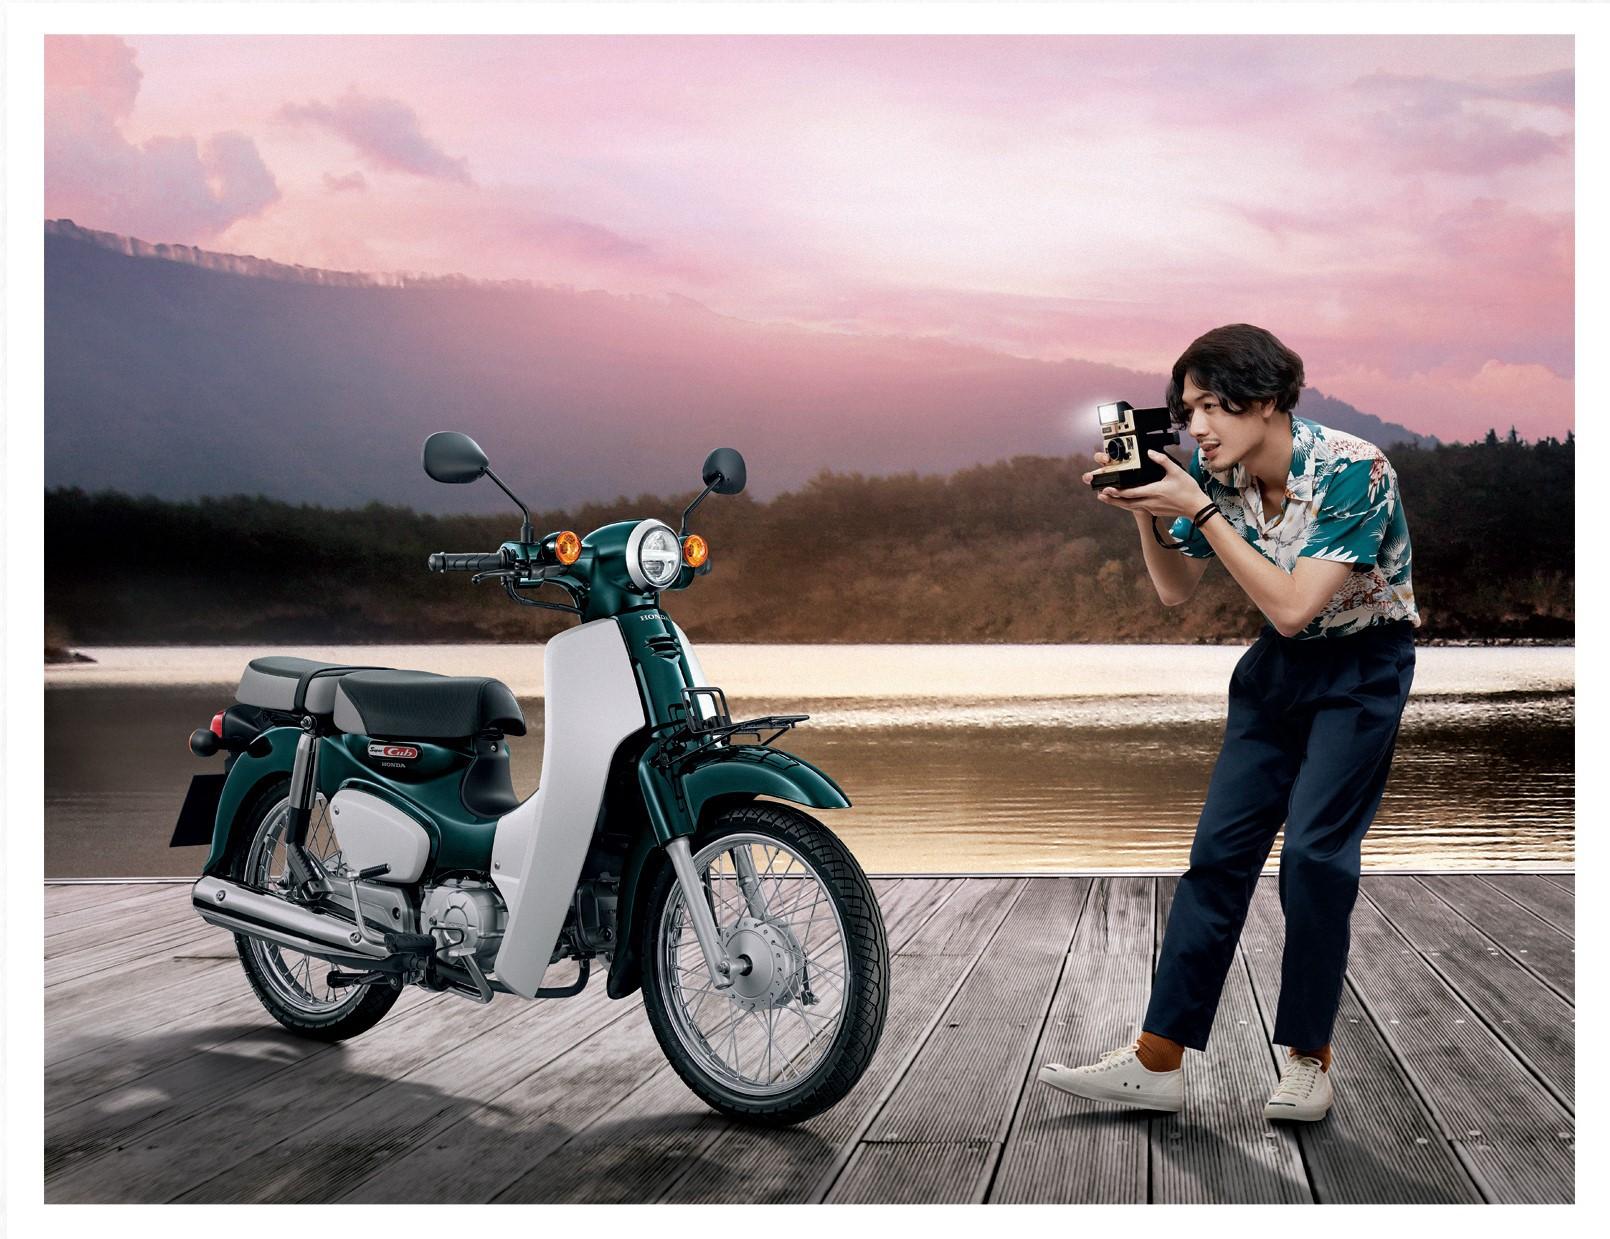 Honda-Motorcycle-มอเตอร์ไซค์-ฮอนด้า-supercub-2018-japanese-retro-News-ข่าวประชาสัมพันธ์-ข่าวผลิตภัณฑ์